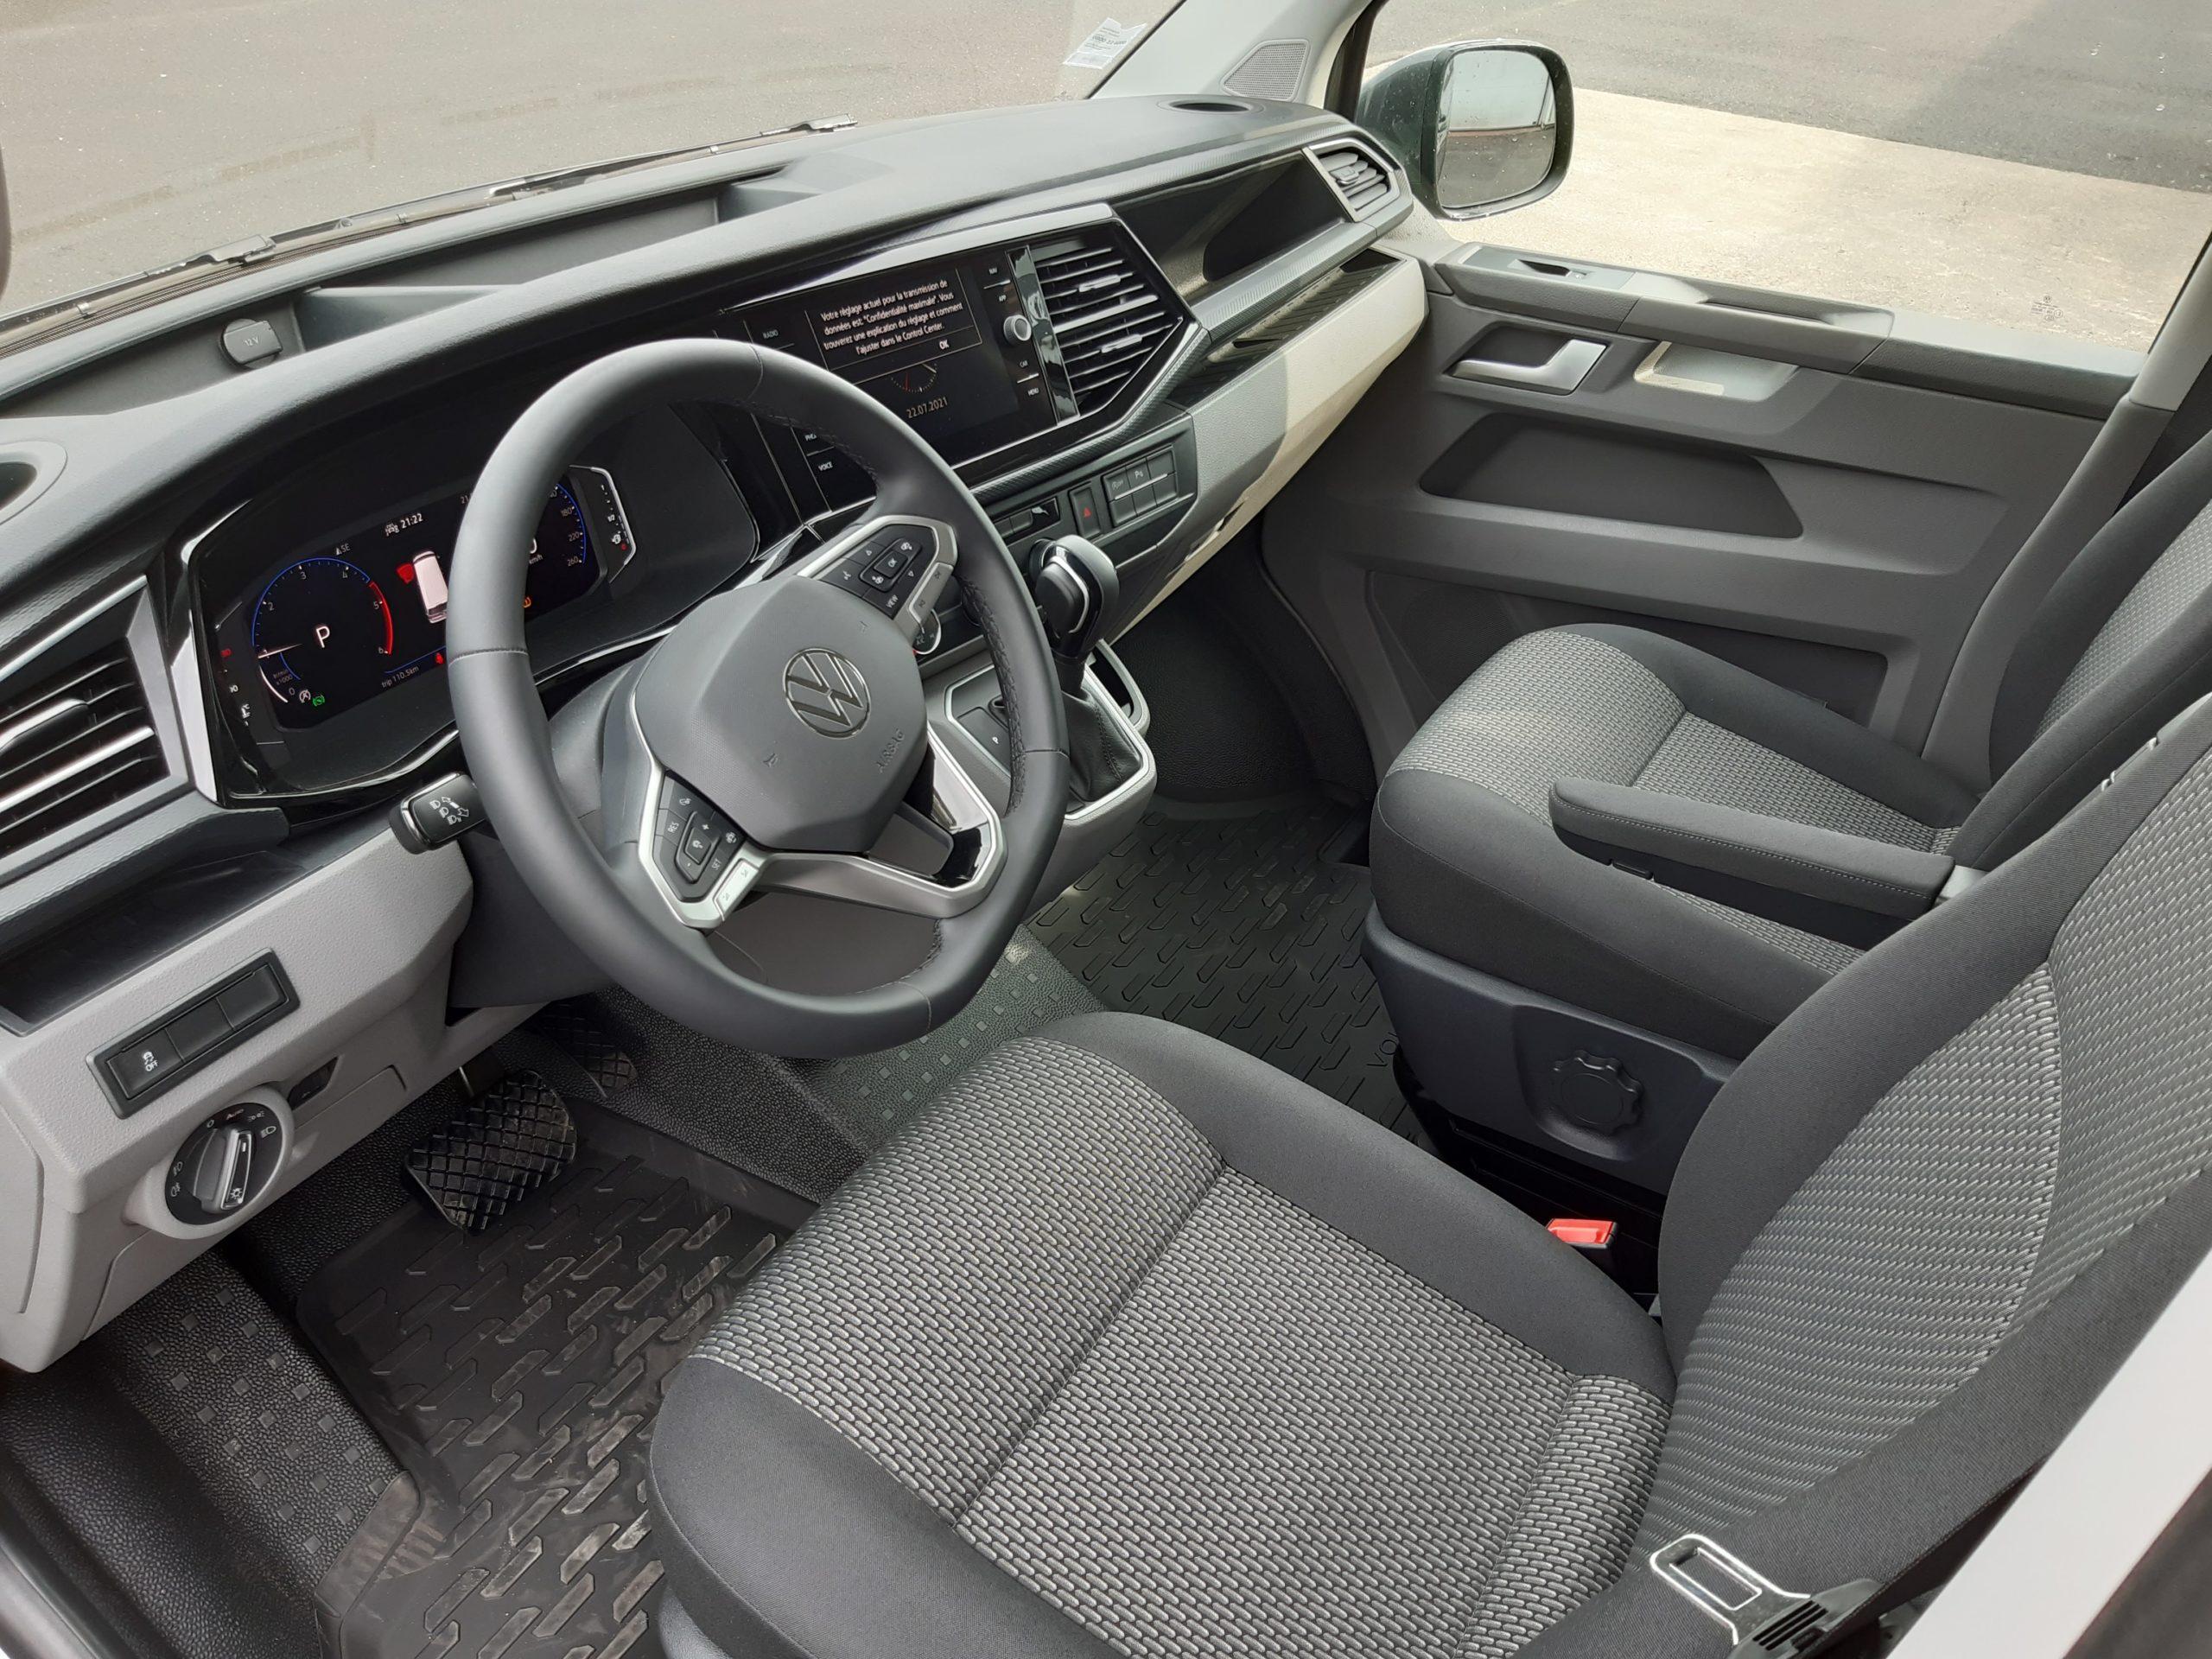 Location d'un fourgon compact double cabine - Volkswagen T6-1 Cabine APP - Vue7